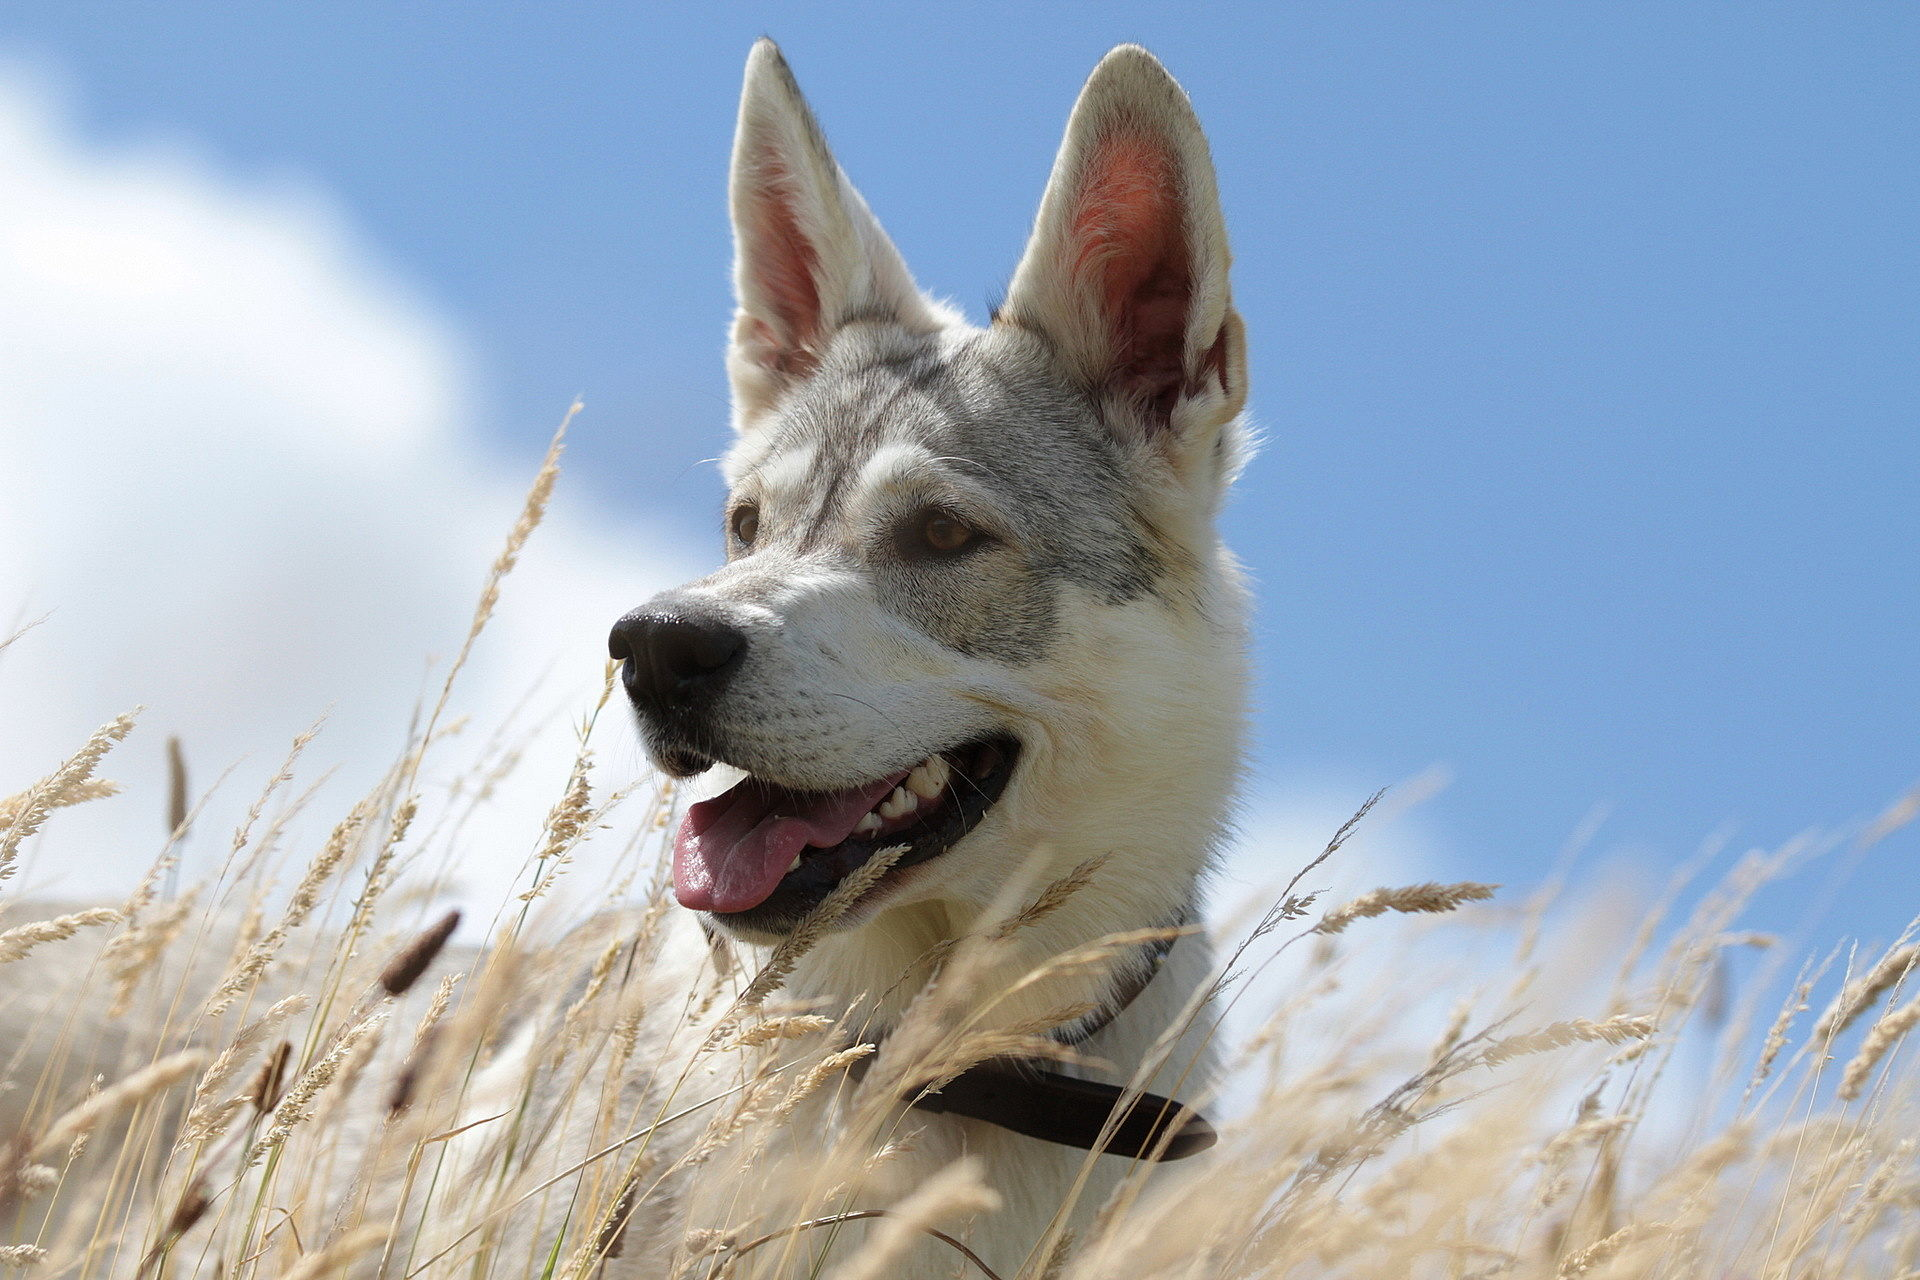 Image: Dog, face, field, ears, sky